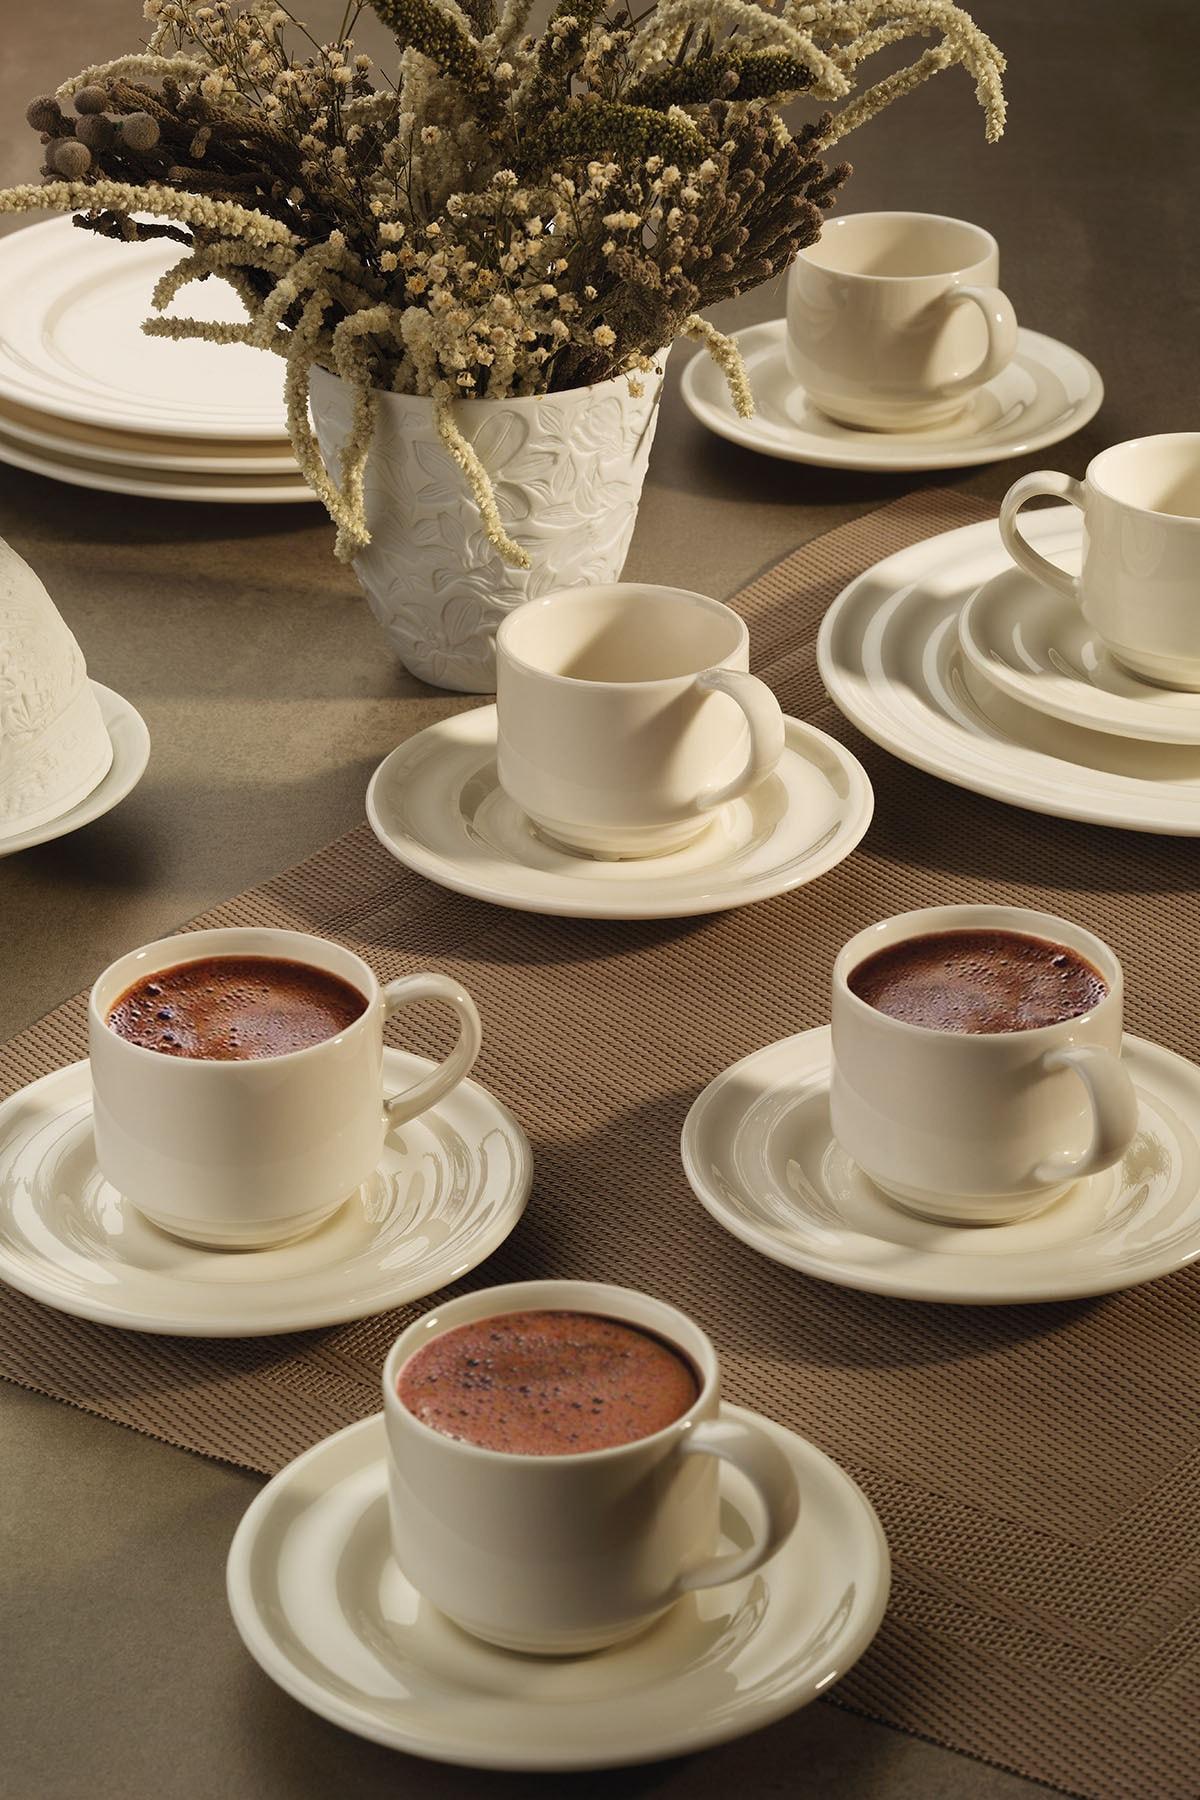 Kütahya Porselen Tuvana Kahve Takımı Krem 1